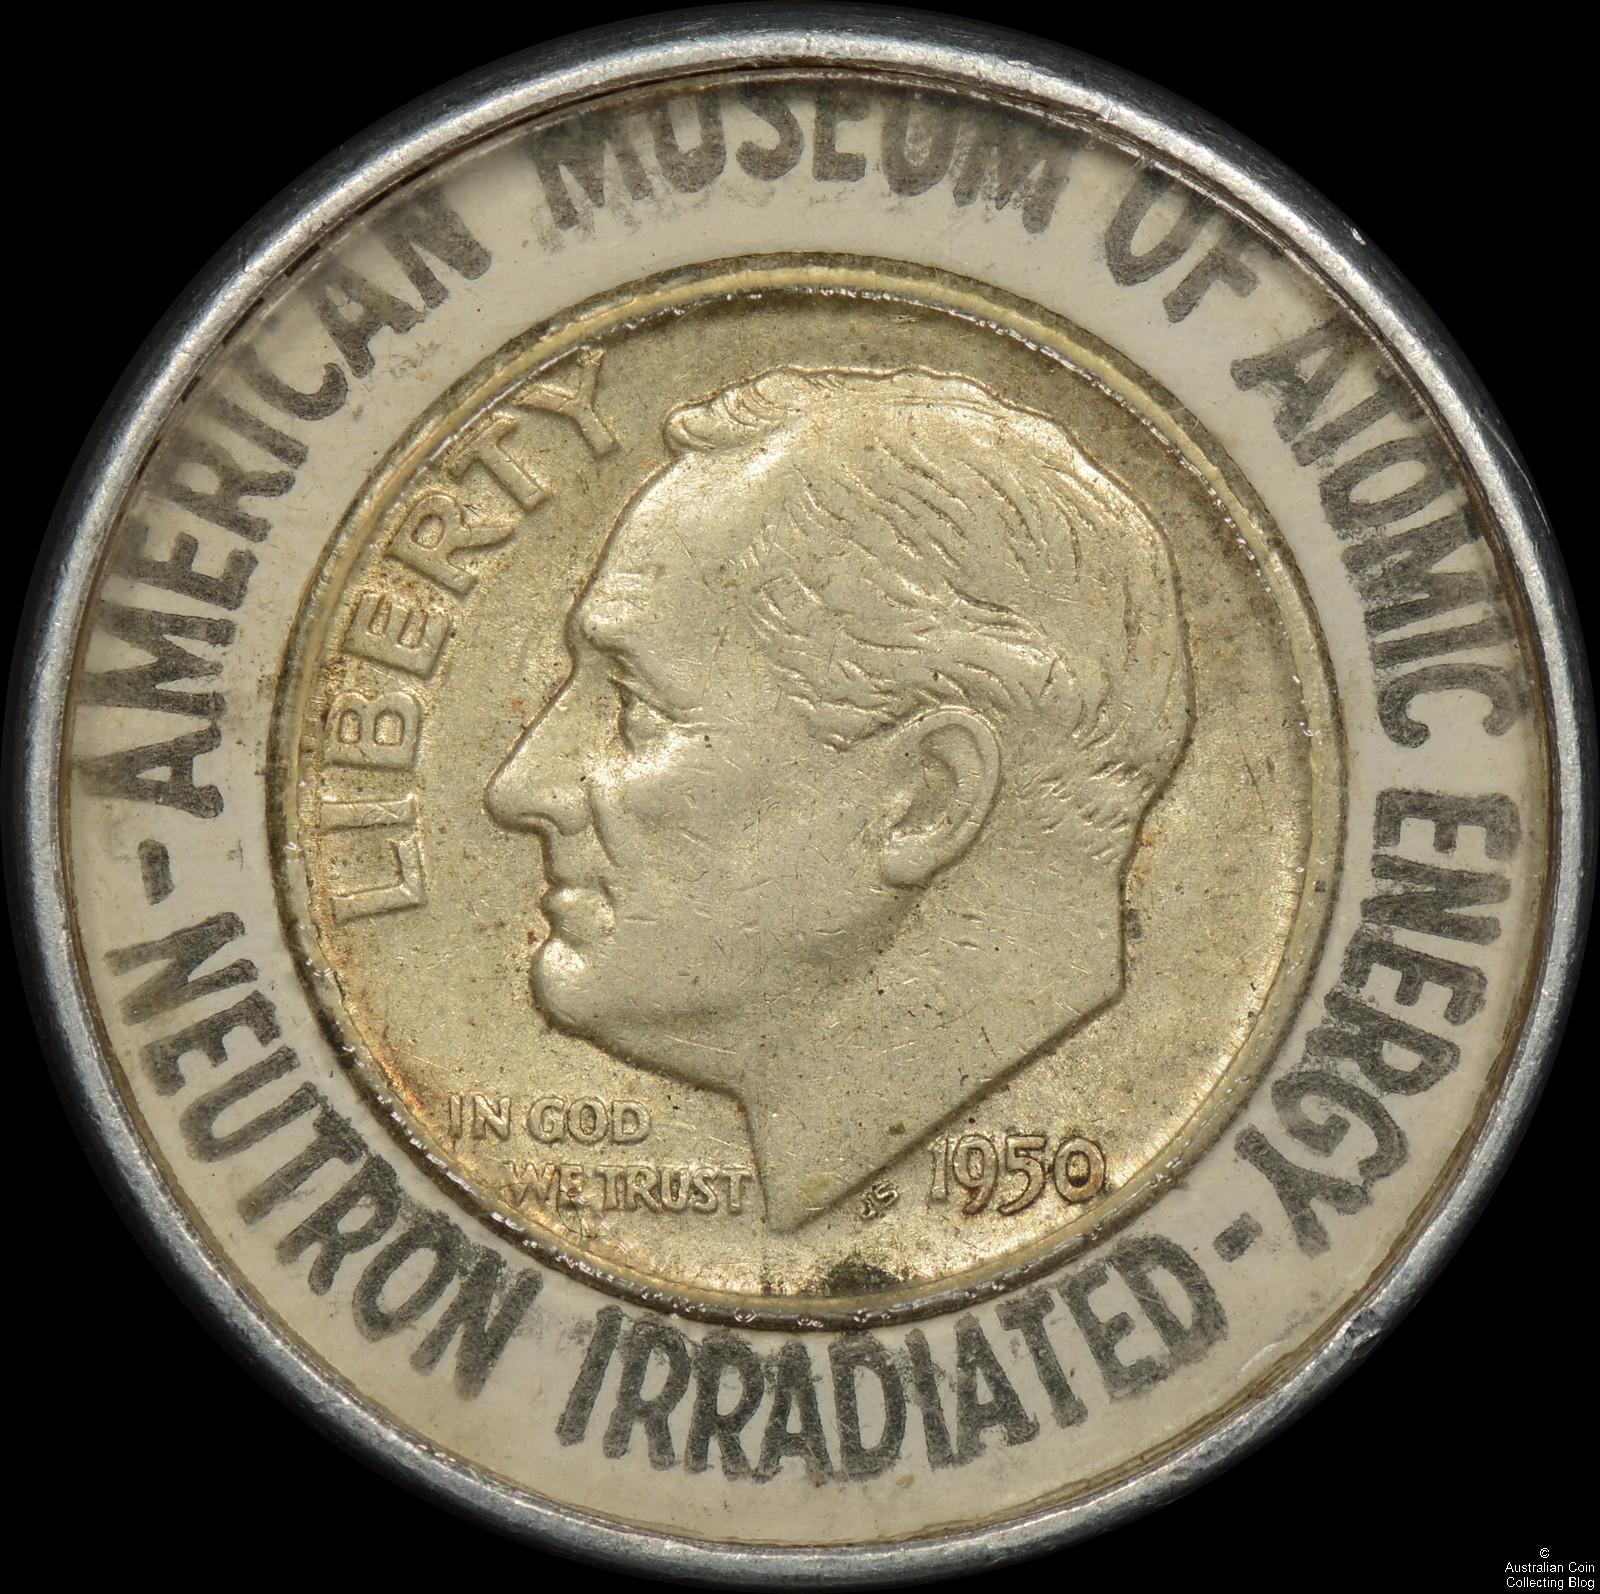 Irradiated Encased Dime - American Museum of Atomic Energy